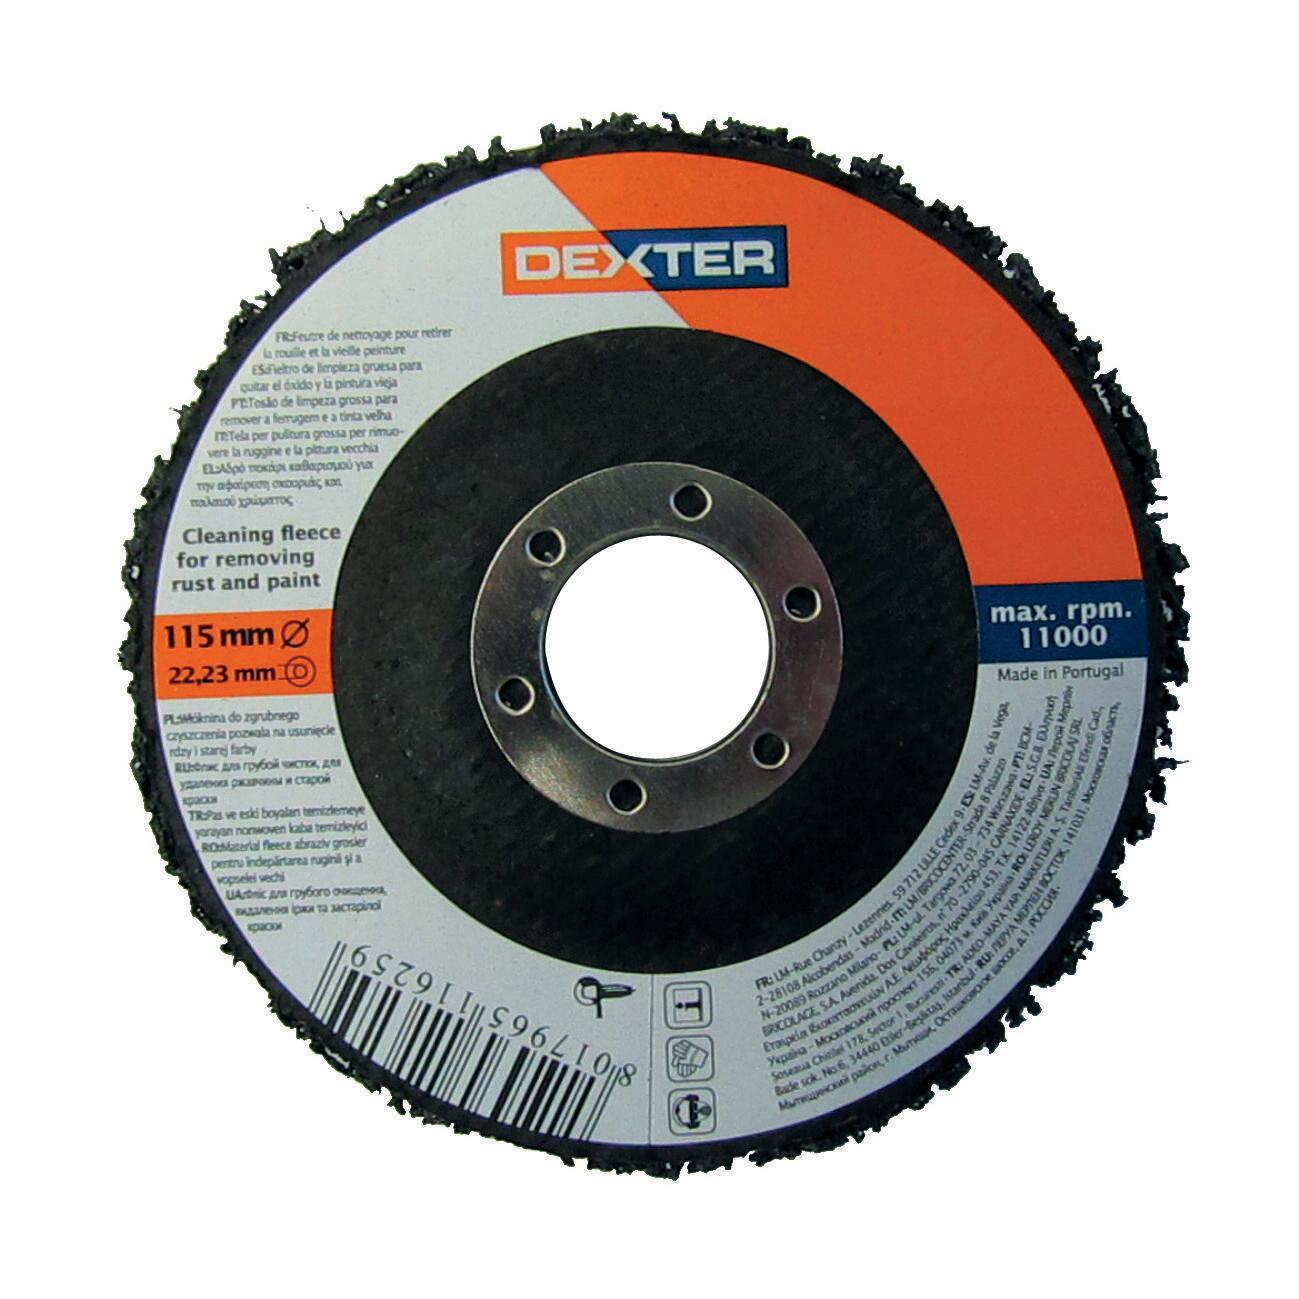 Disco lamellare DEXTER grv Ø 115 mm grana Assortita - 2